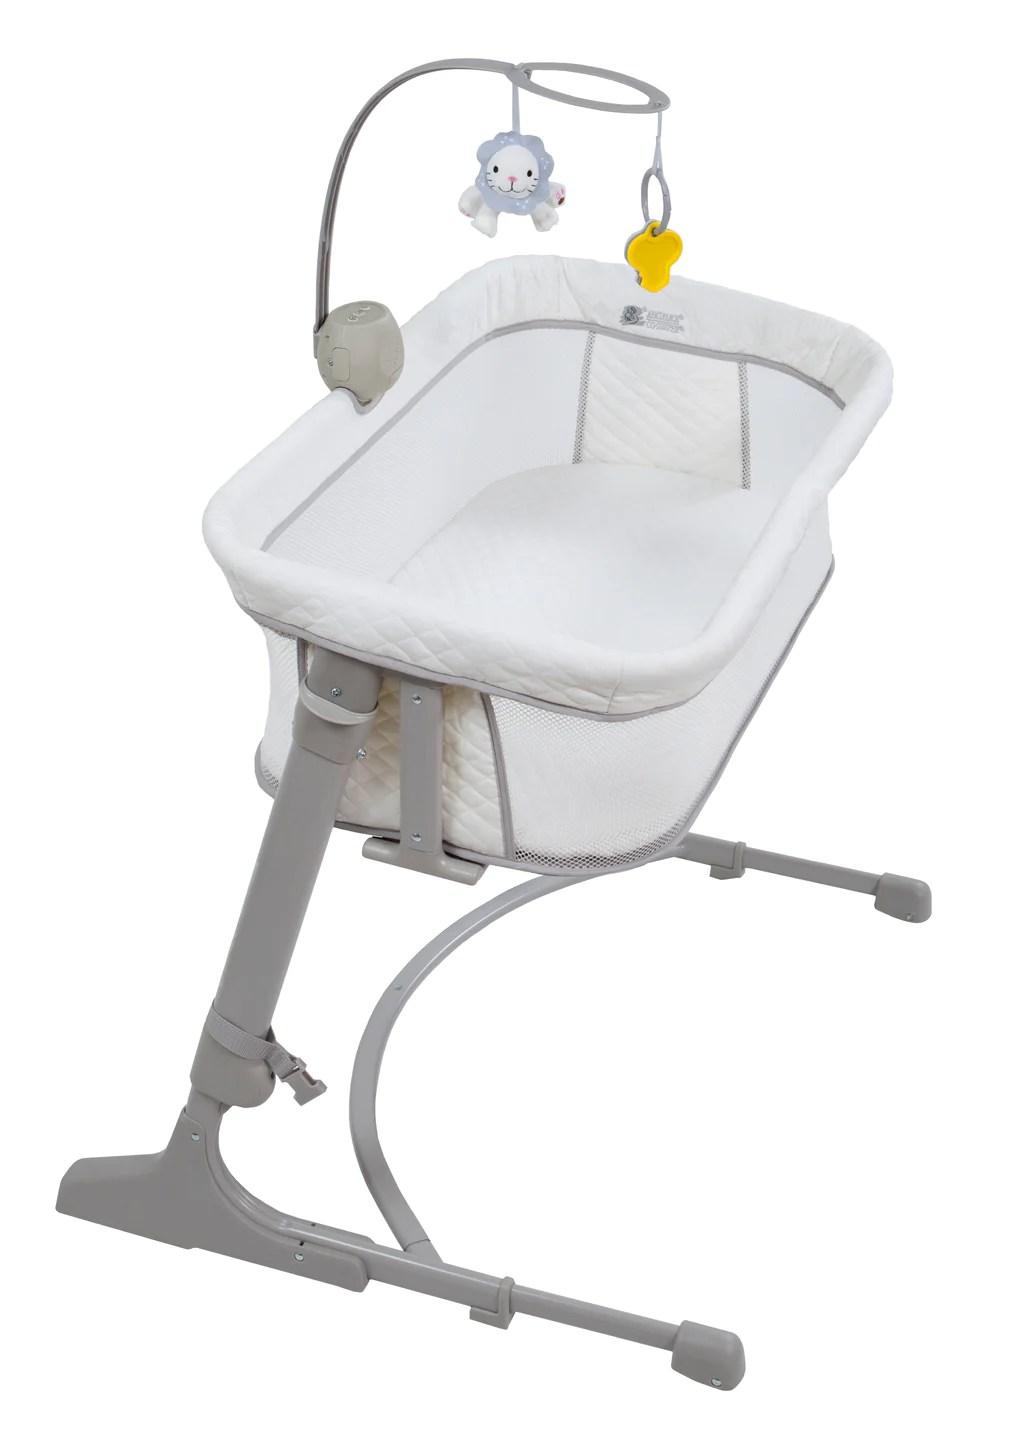 Co Sleeper Crib Babies R Us : sleeper, babies, Arm's, Reach®, Co-Sleeper®, Bassinets, Reach, Concepts